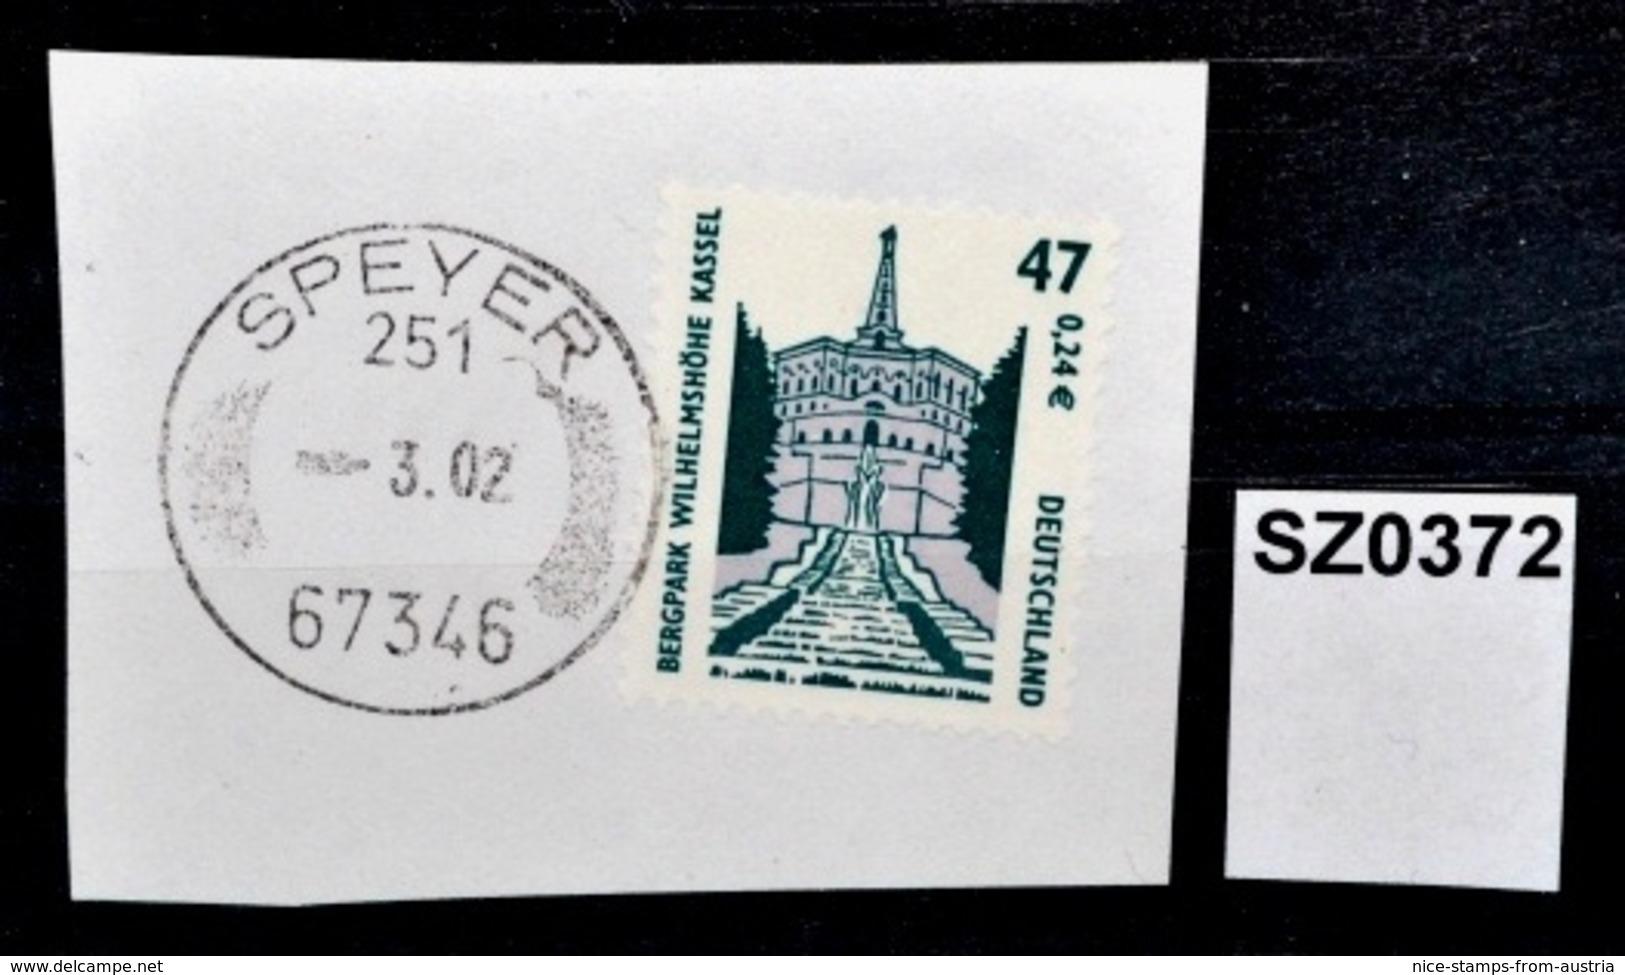 SZ0372 Stempel Ohne Jahresangabe, 67343 Speyer 251 DE ???? - [7] Federal Republic